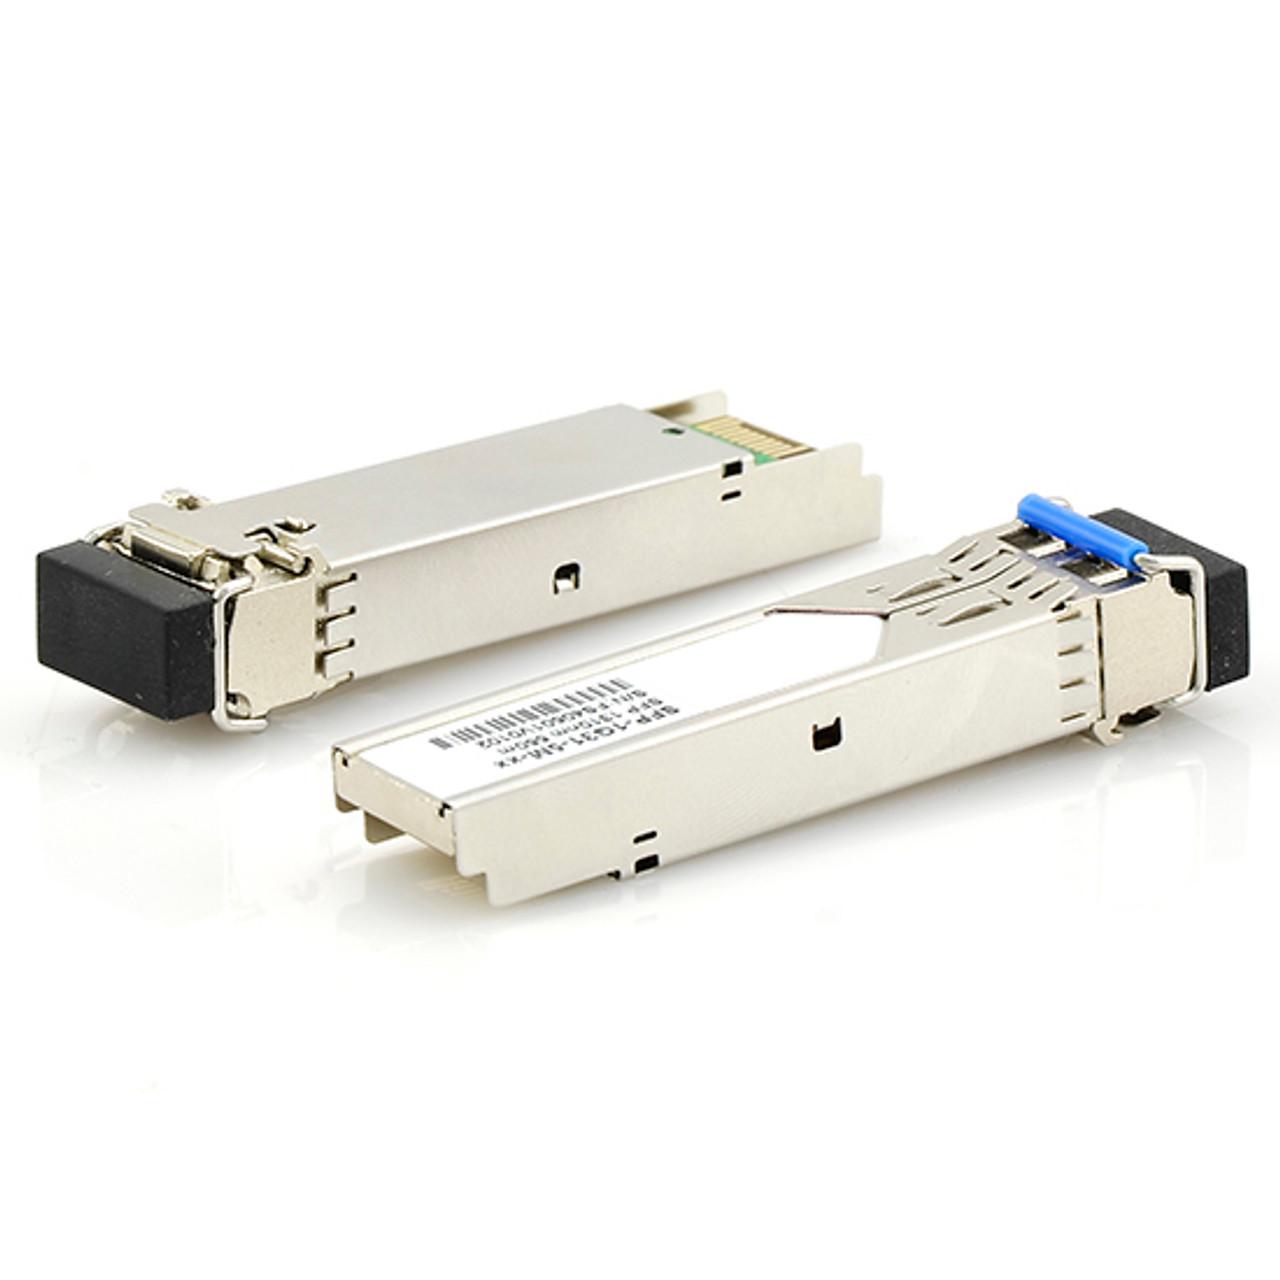 Cisco GLC-LH-SMD Compatible 1000BASE-LX/LH SFP 1310nm 10km EXT DDM  Transceiver Module